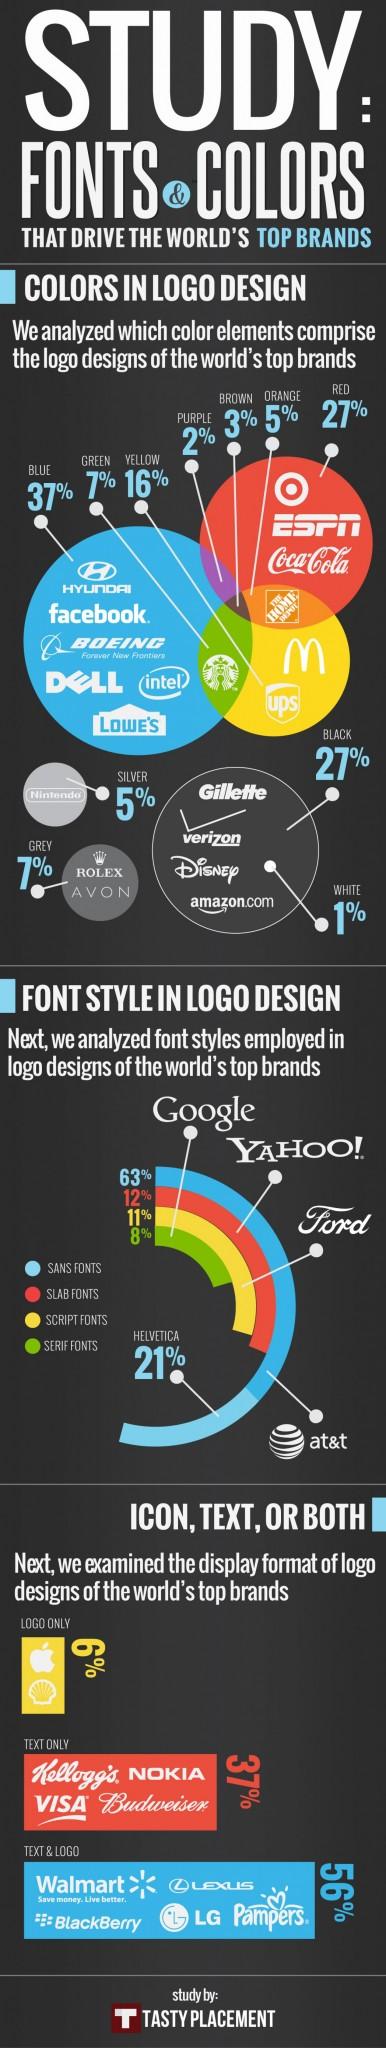 Exempel på infographic